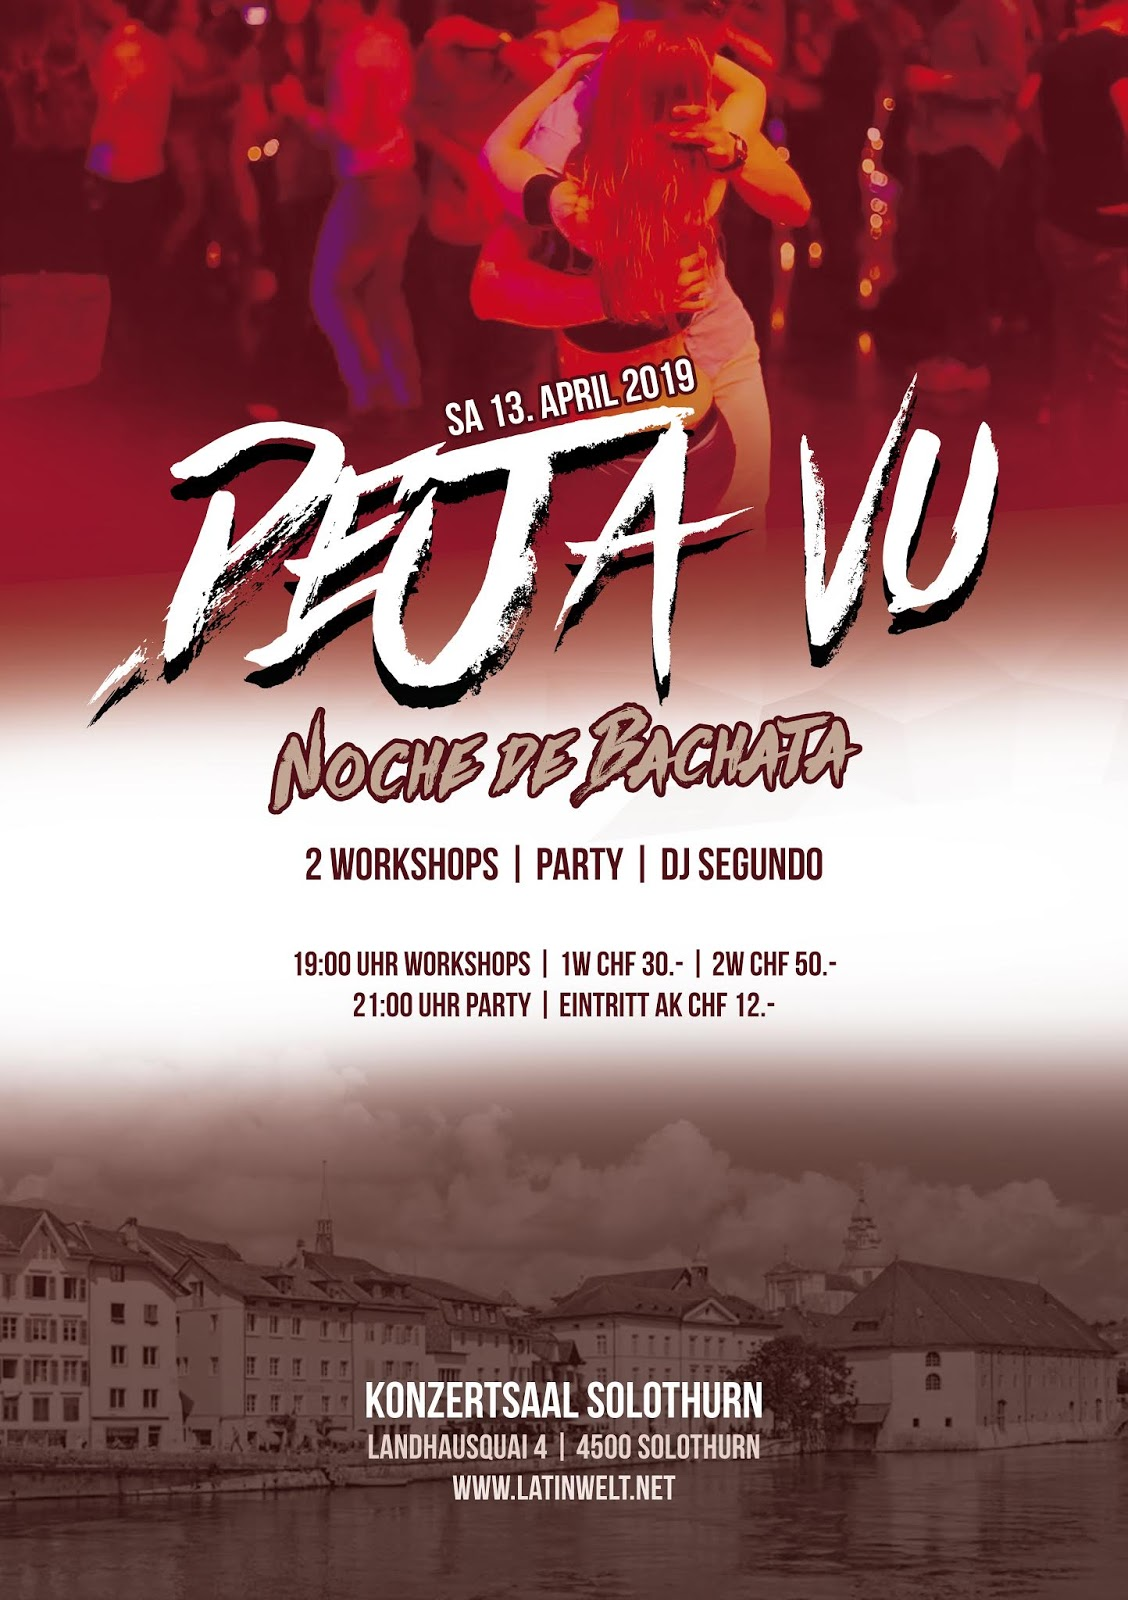 DEJA VU, NOCHE DE BACHATA | SA. 13.04.2019